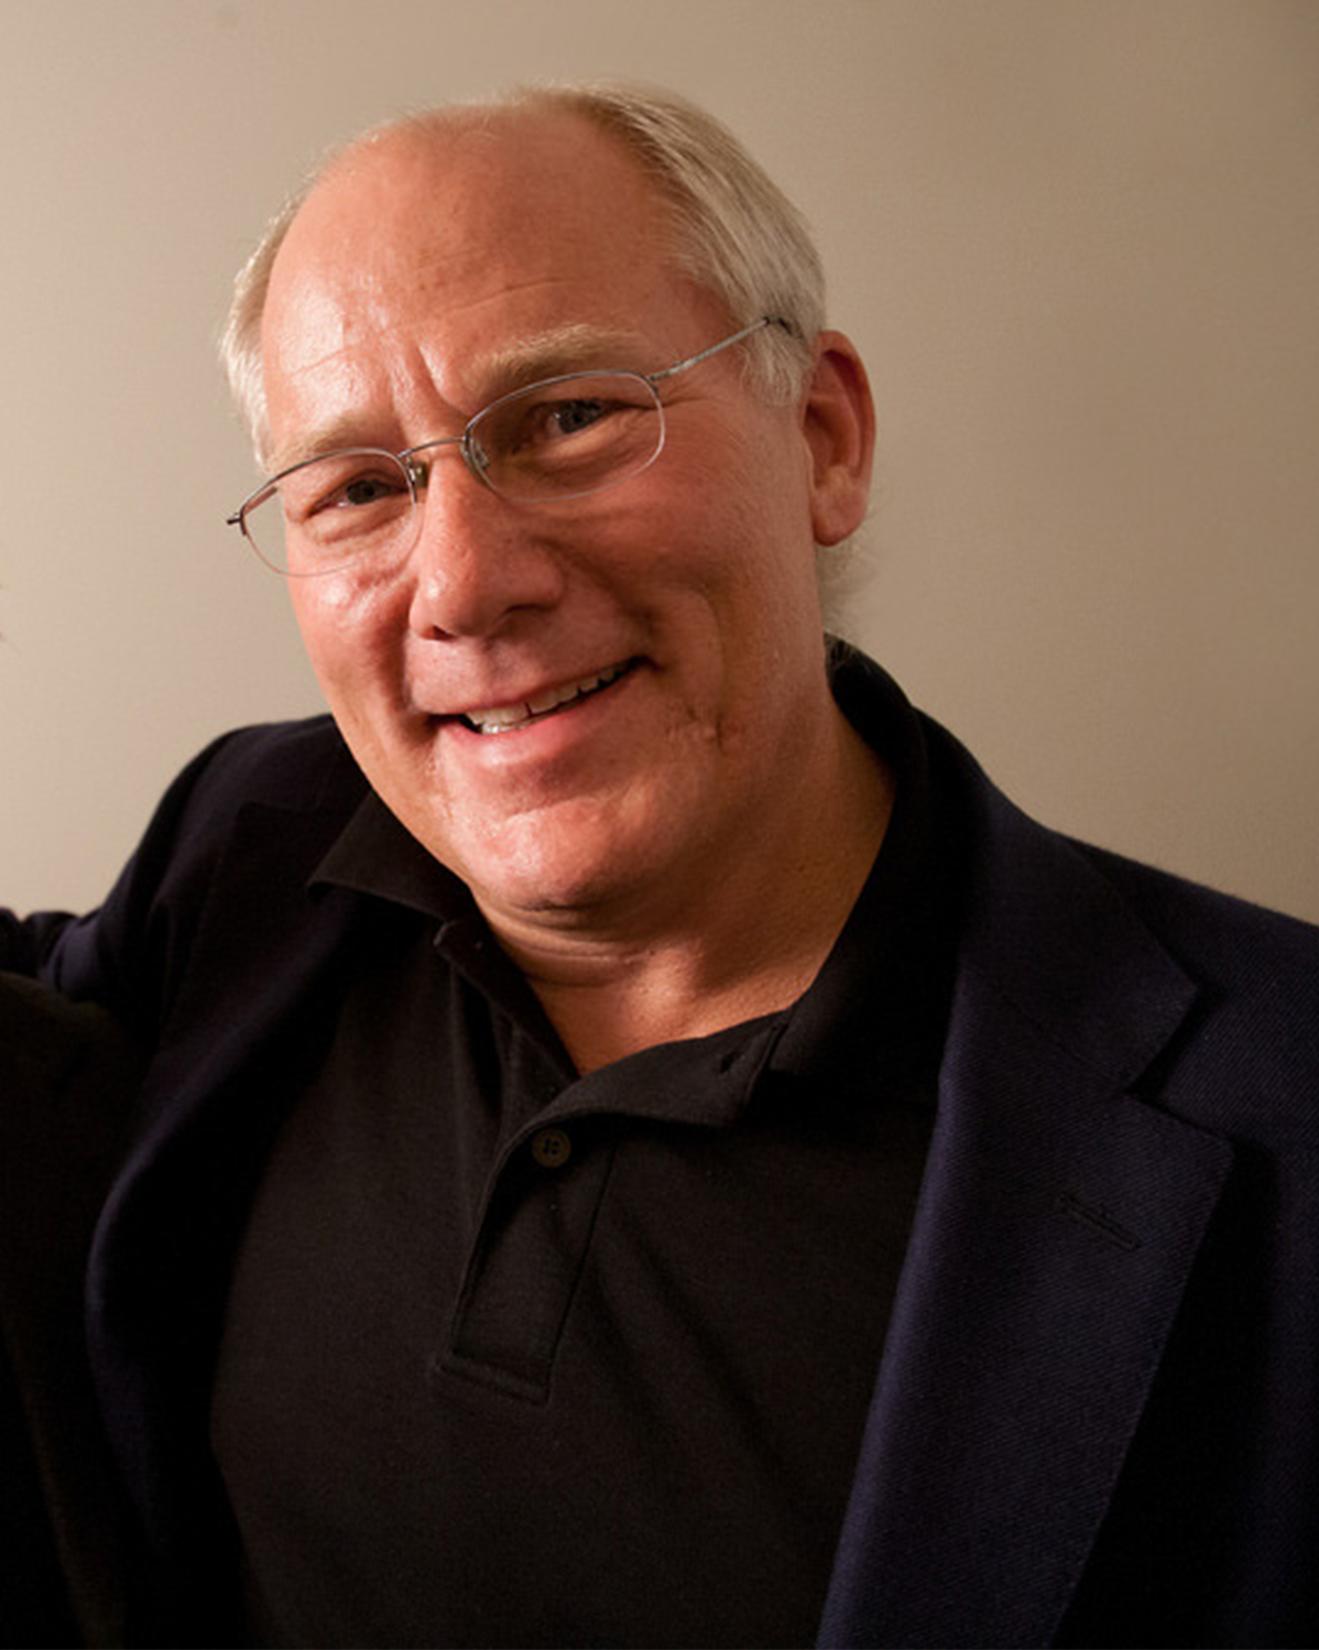 Dr. Andy Aldrin | President, Aldrin Family Foundation